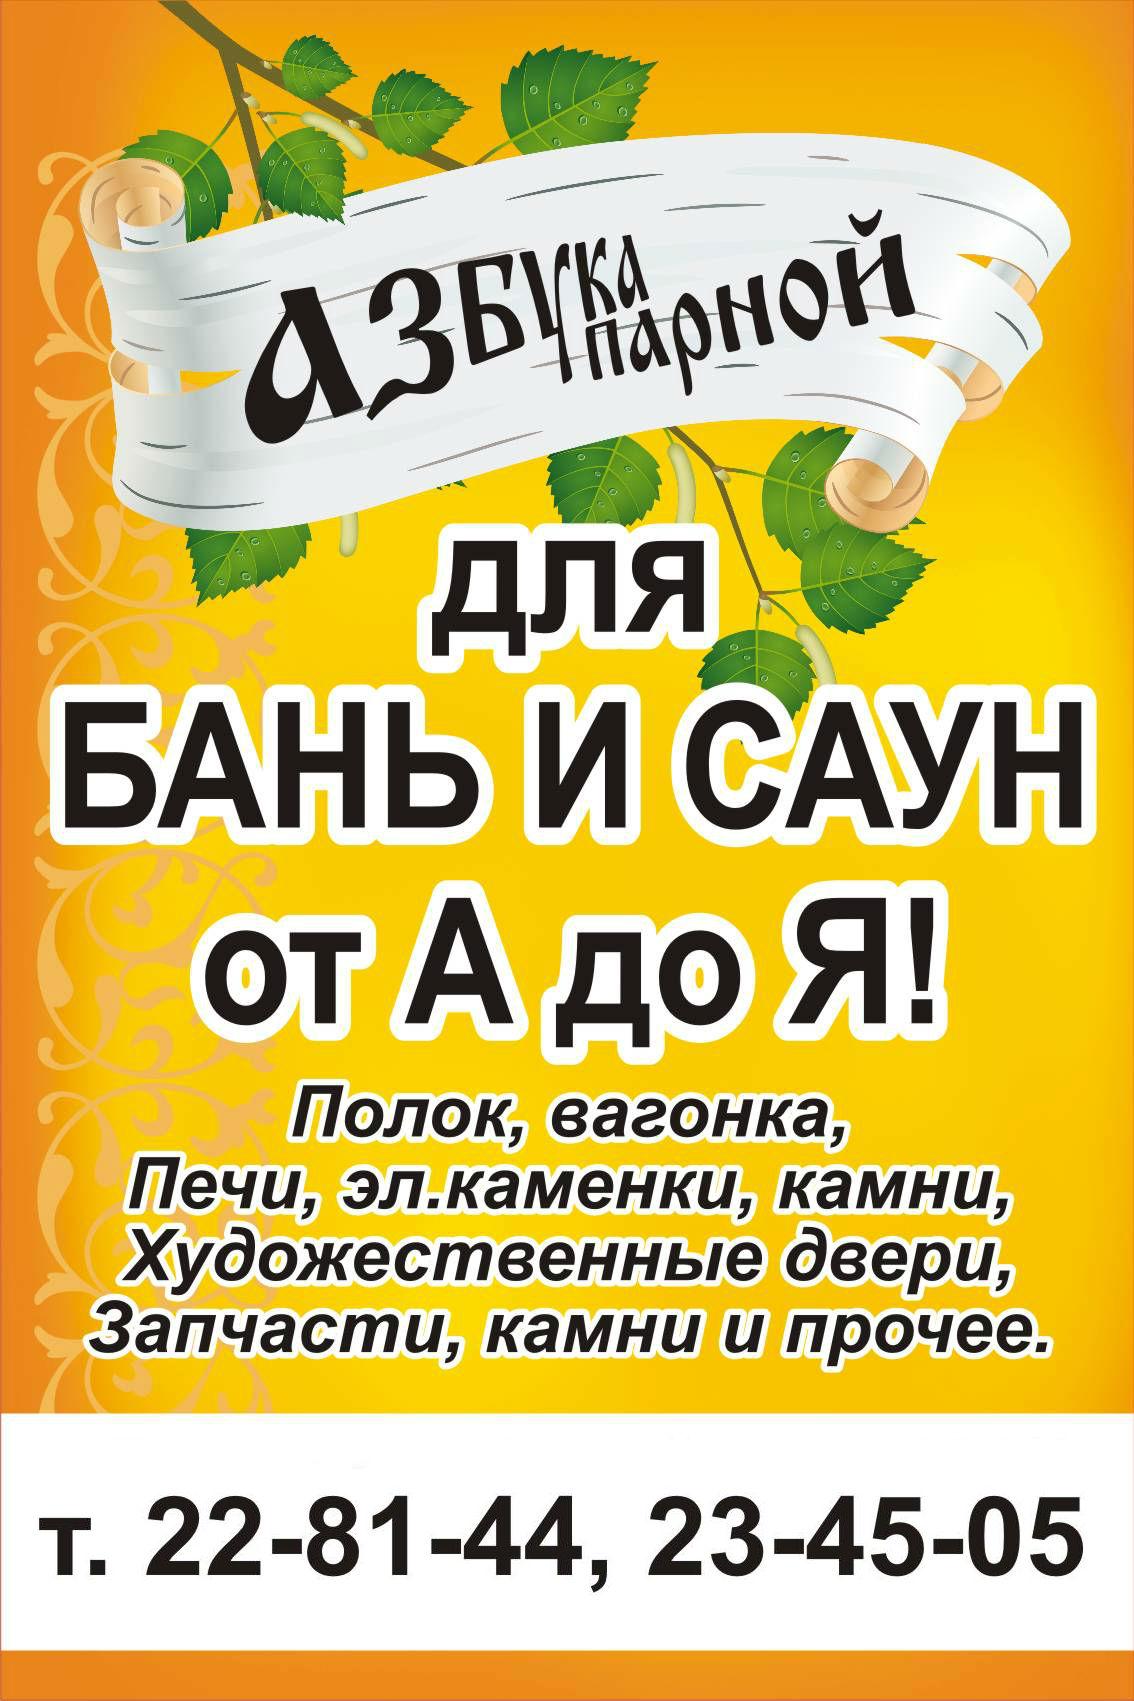 АзбукаПарной_в_мэйл_ЖЕЛТЫЙ_1.jpg